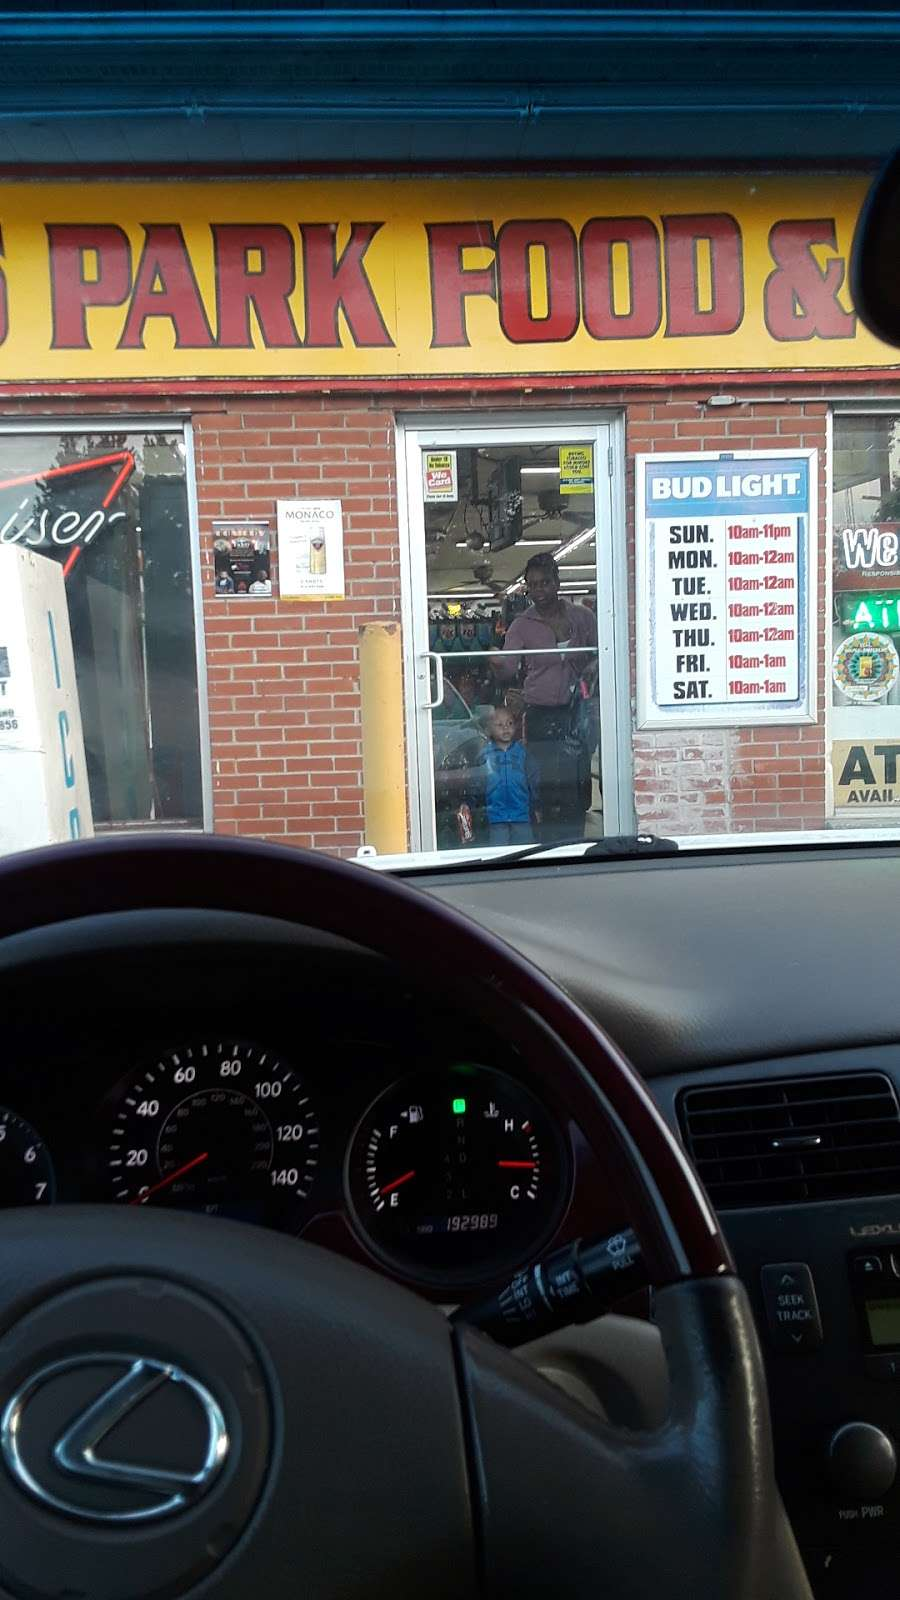 Ingalls Park Food & Liquor - store  | Photo 1 of 4 | Address: 1822 E Washington St, Joliet, IL 60433, USA | Phone: (815) 727-2051